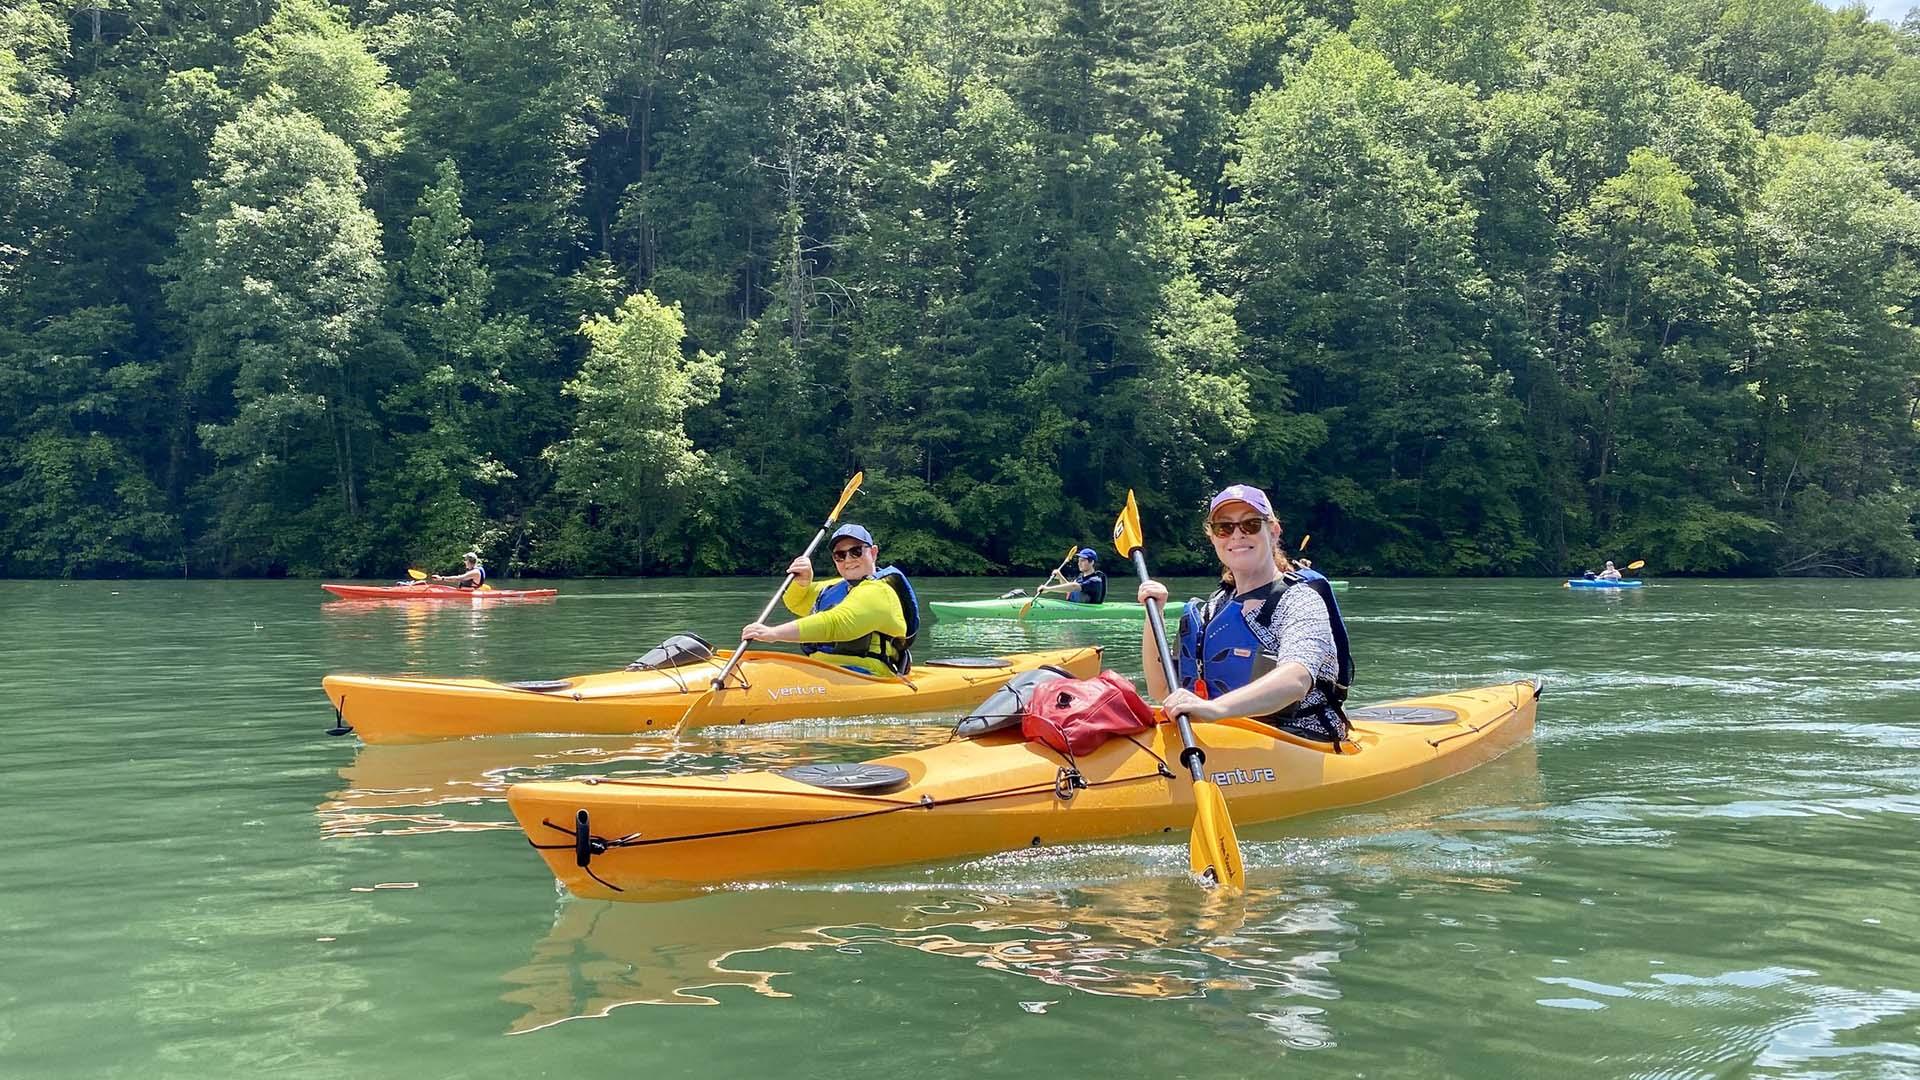 Recreation around Lake Jocassee - GREENVILLE JOURNAL